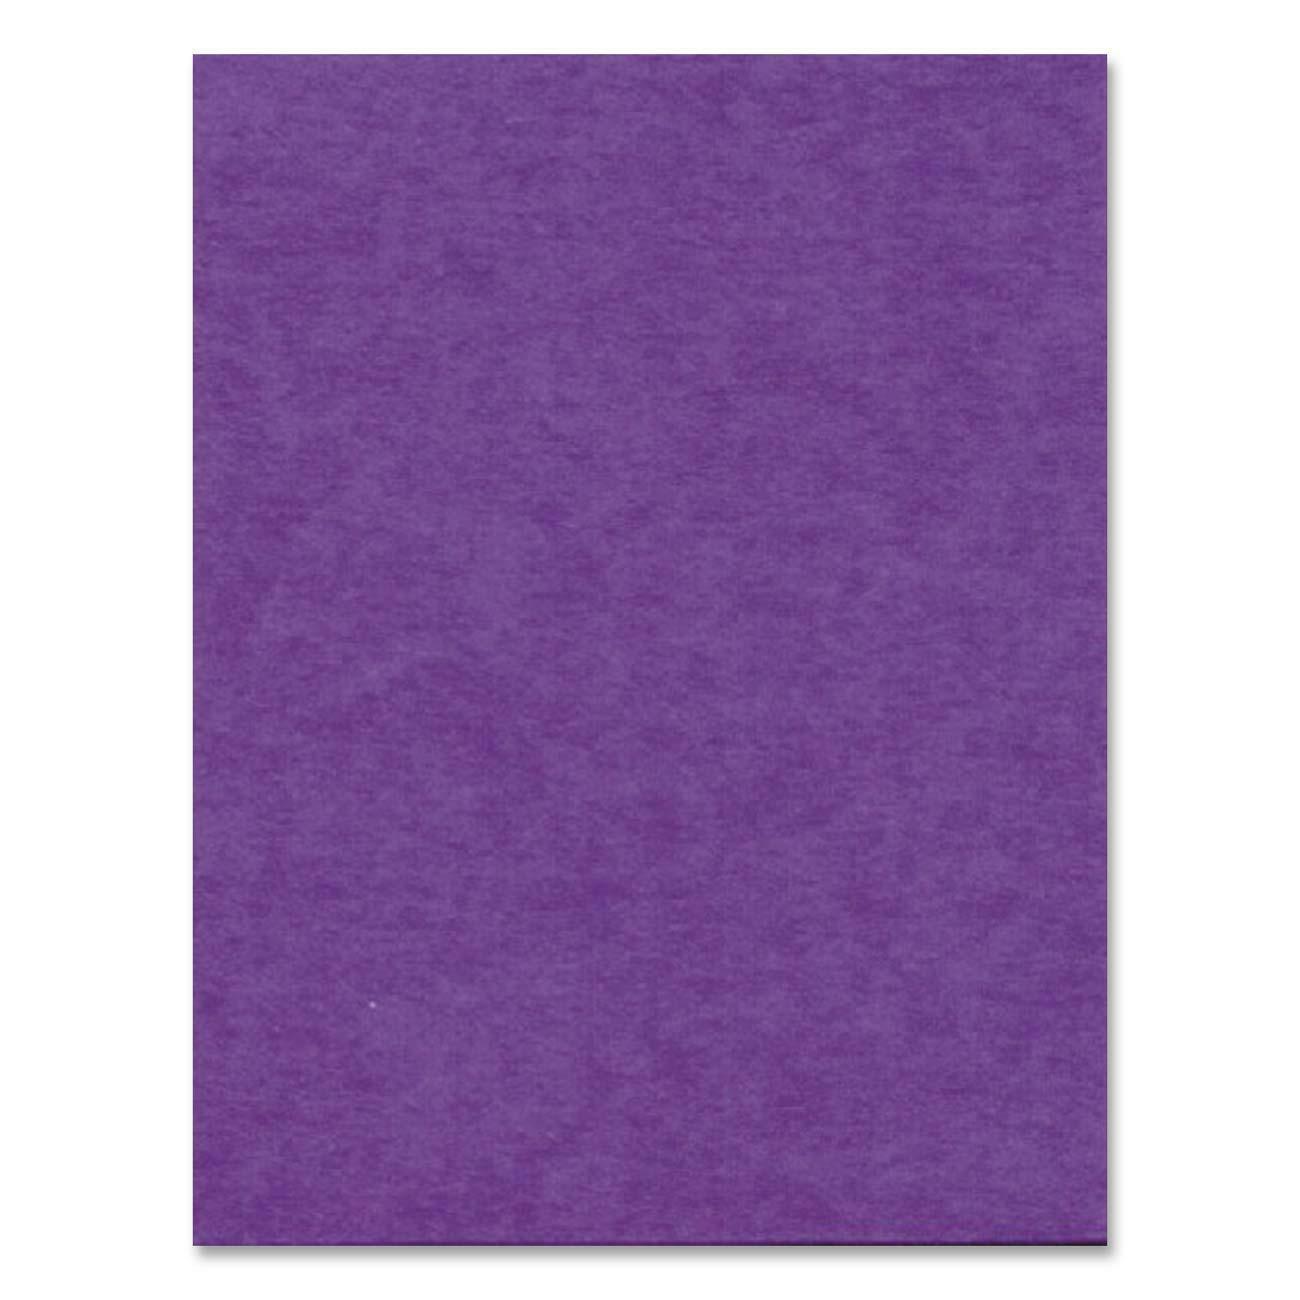 Supplies :: Teaching u0026 Art :: Poster u0026 Foam Boards :: Poster Boards ...